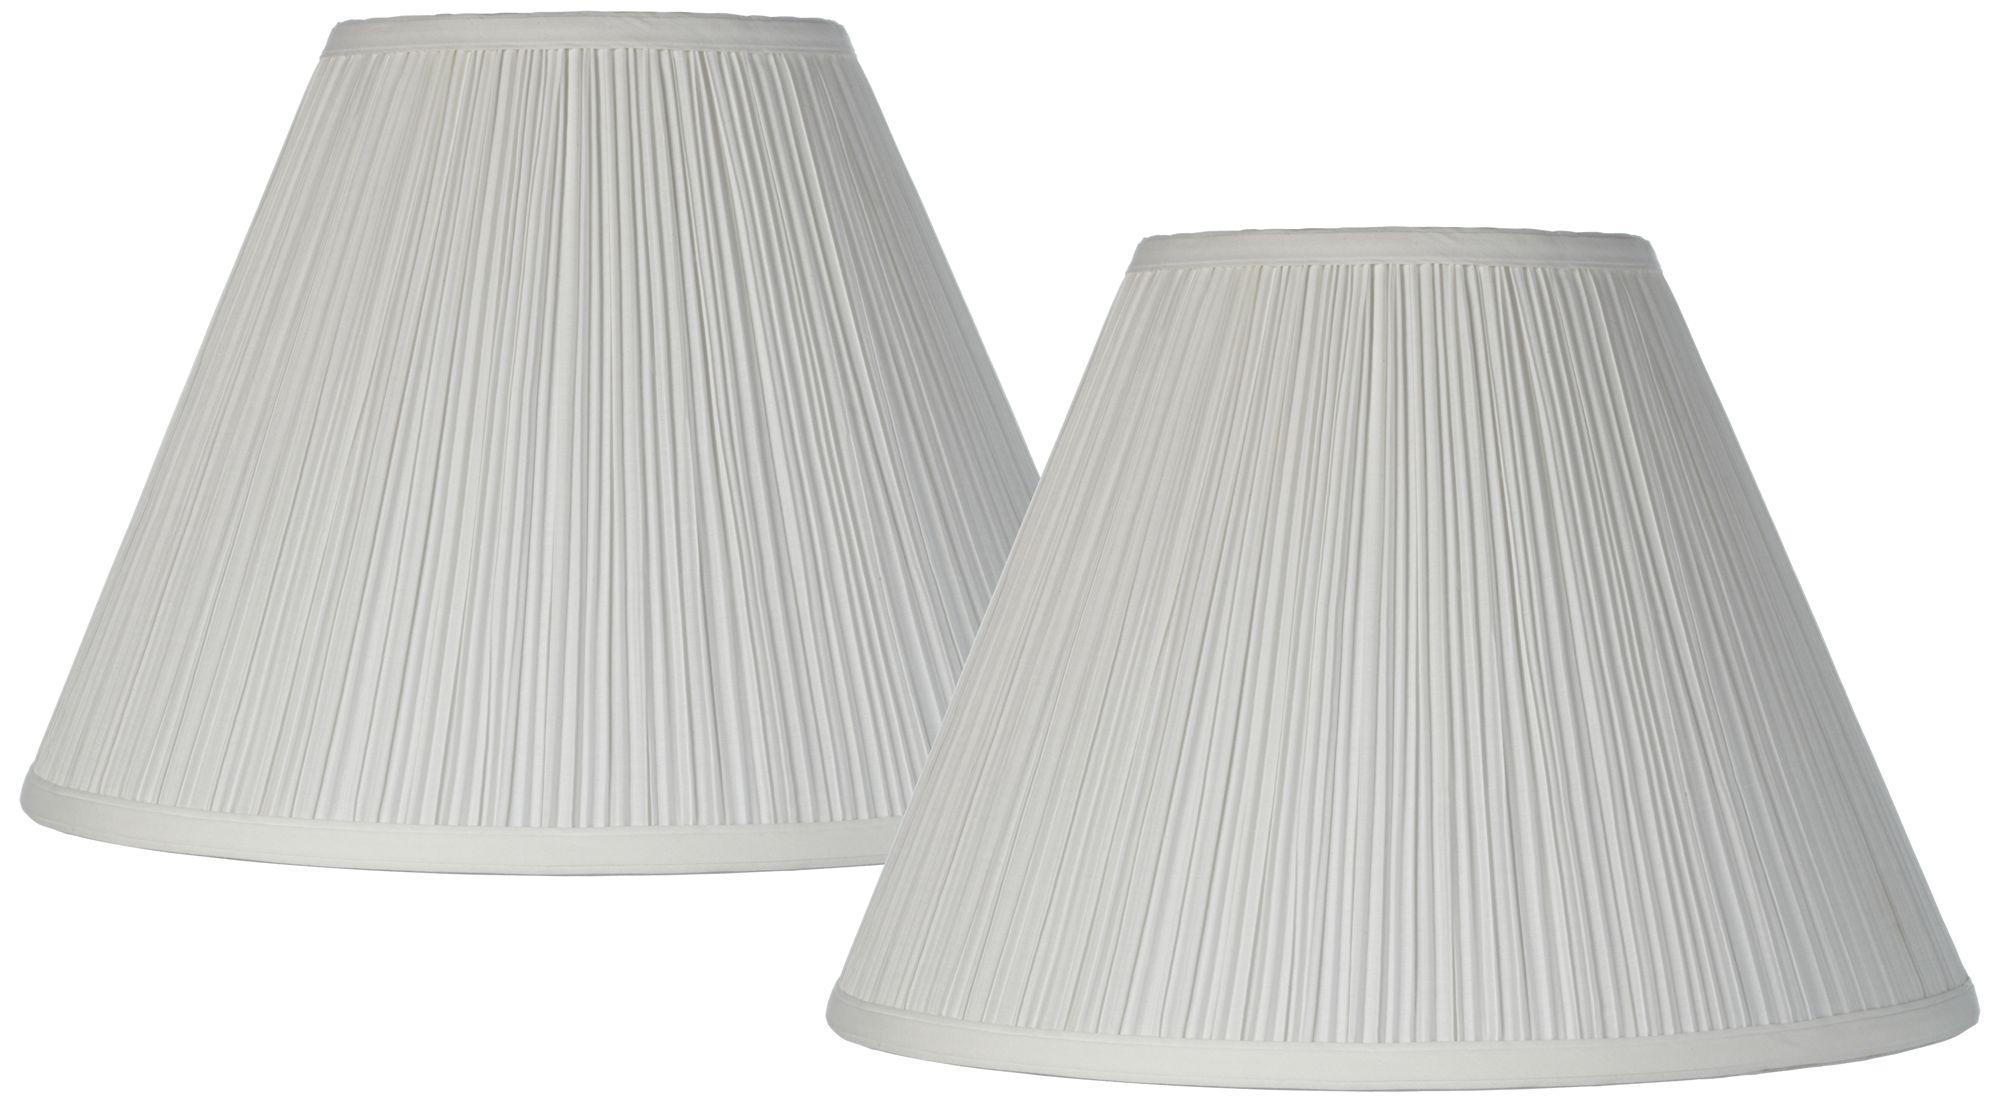 Antique White Set Of 2 Lamp Shades 6.5x15x11